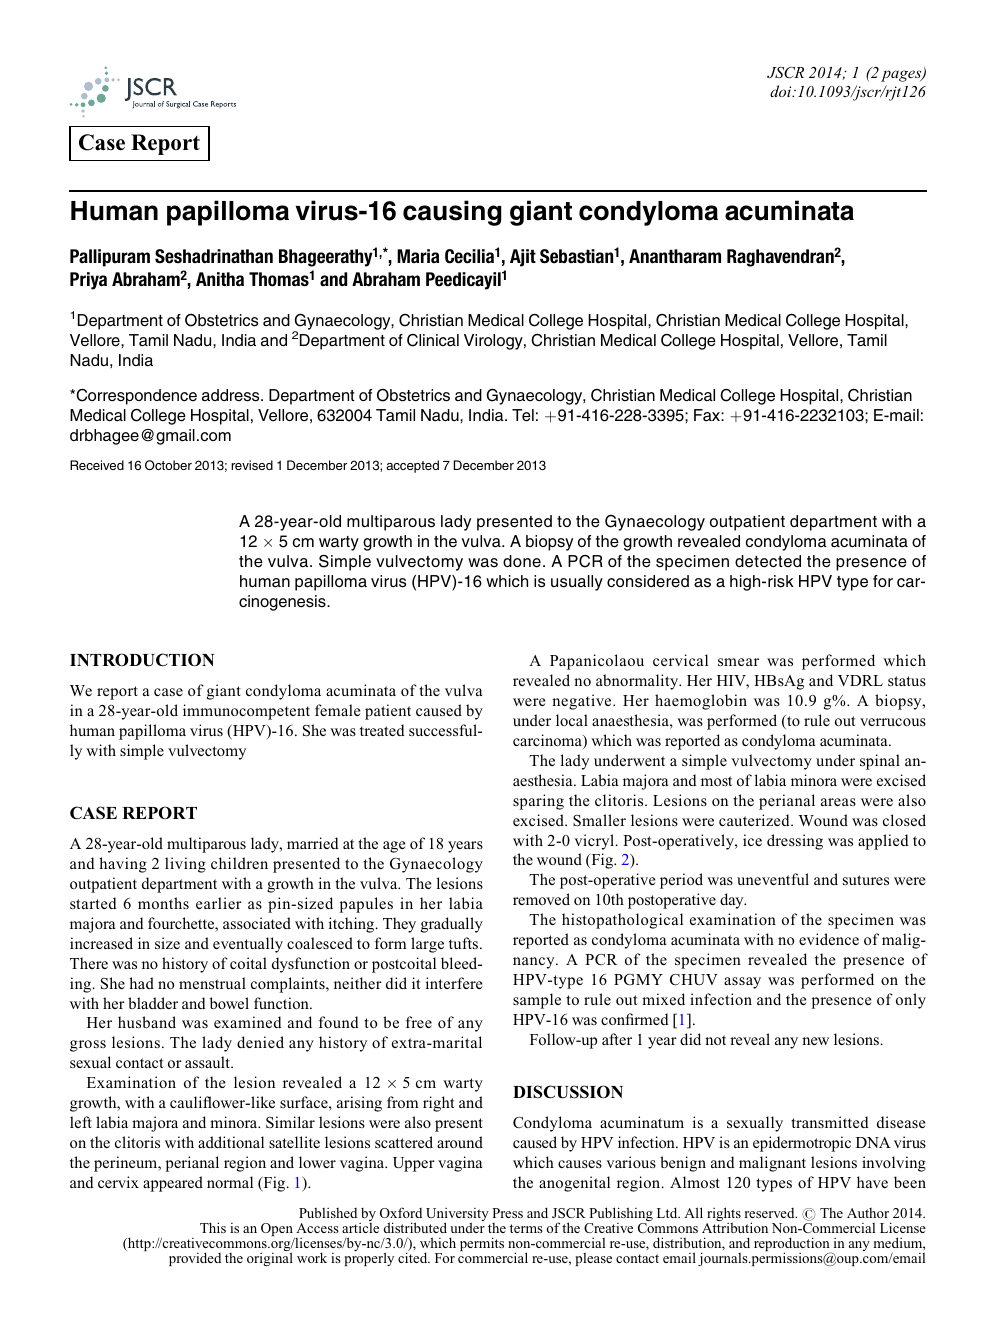 human papilloma virus case report